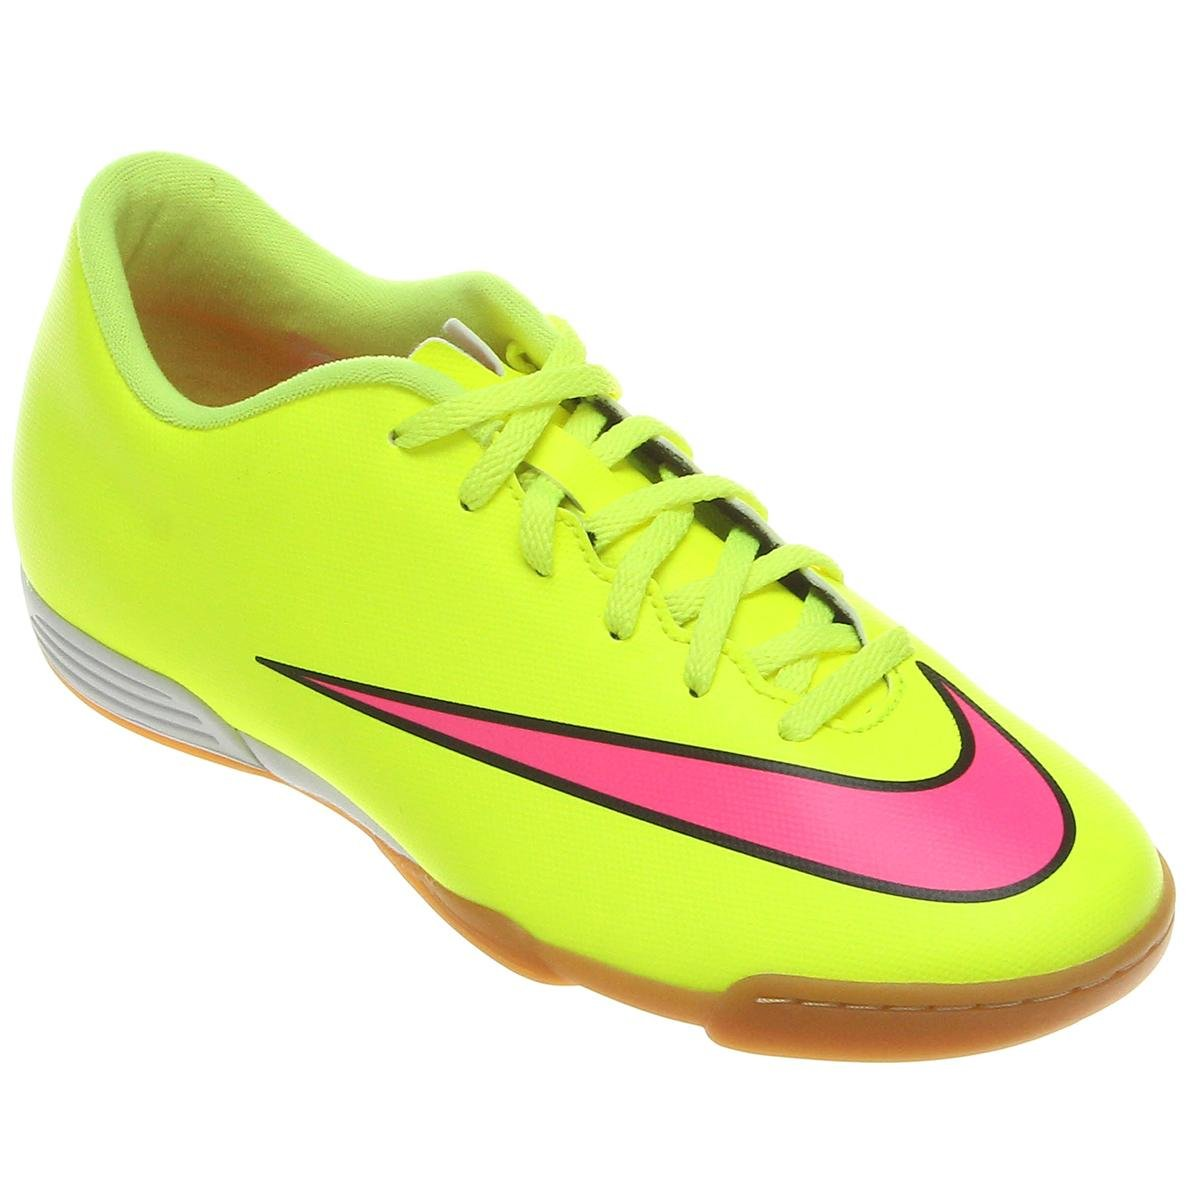 e4e479389da47 Chuteira Futsal Nike Mercurial Vortex 2 IC - Compre Agora